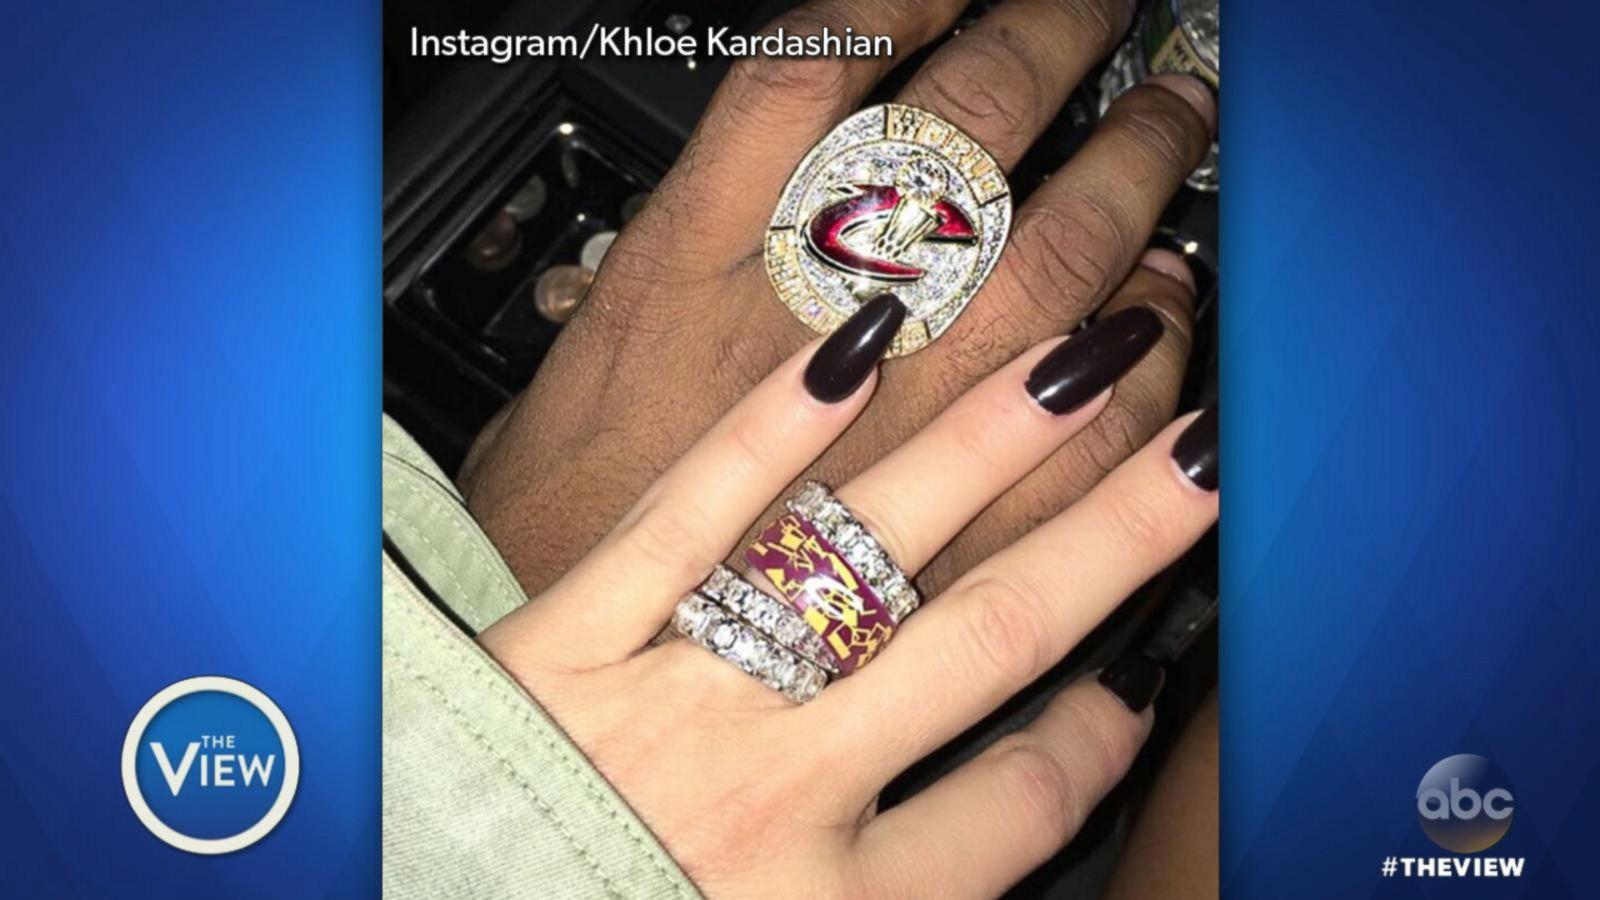 VIDEO: Khloe Kardashian Flaunts Diamond Rings on Instagram Following Sister's Robbery